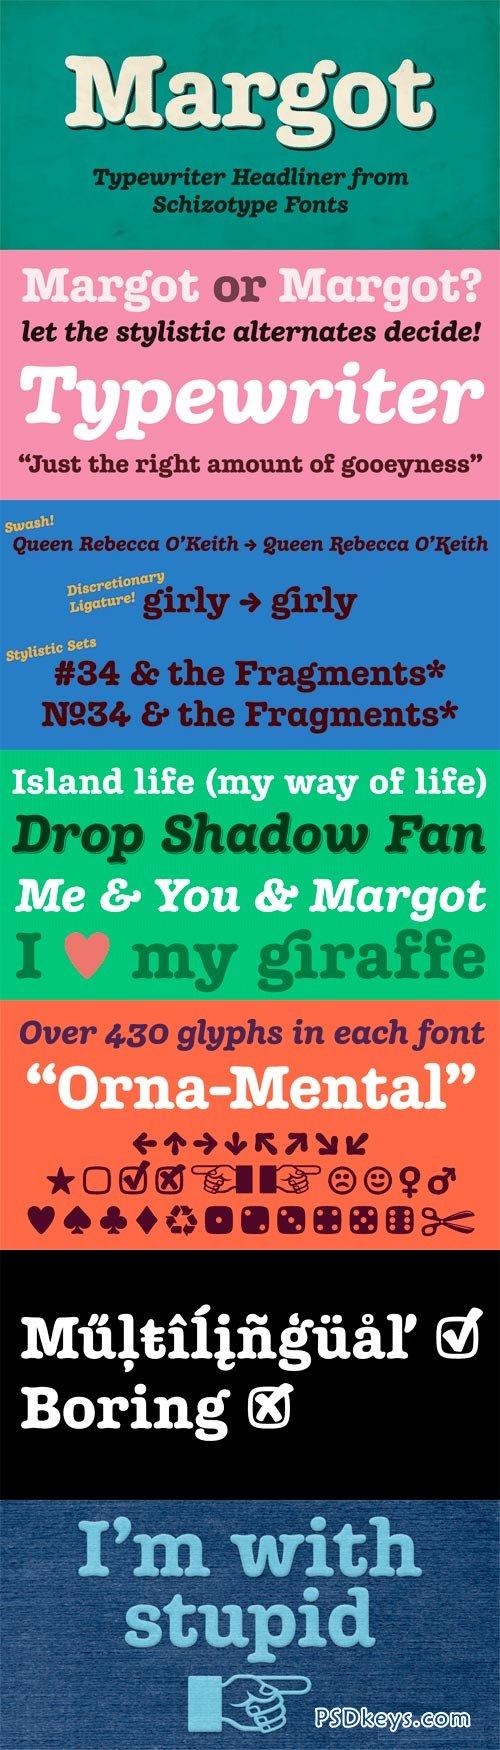 Margot Font Family - 2 Fonts for $50